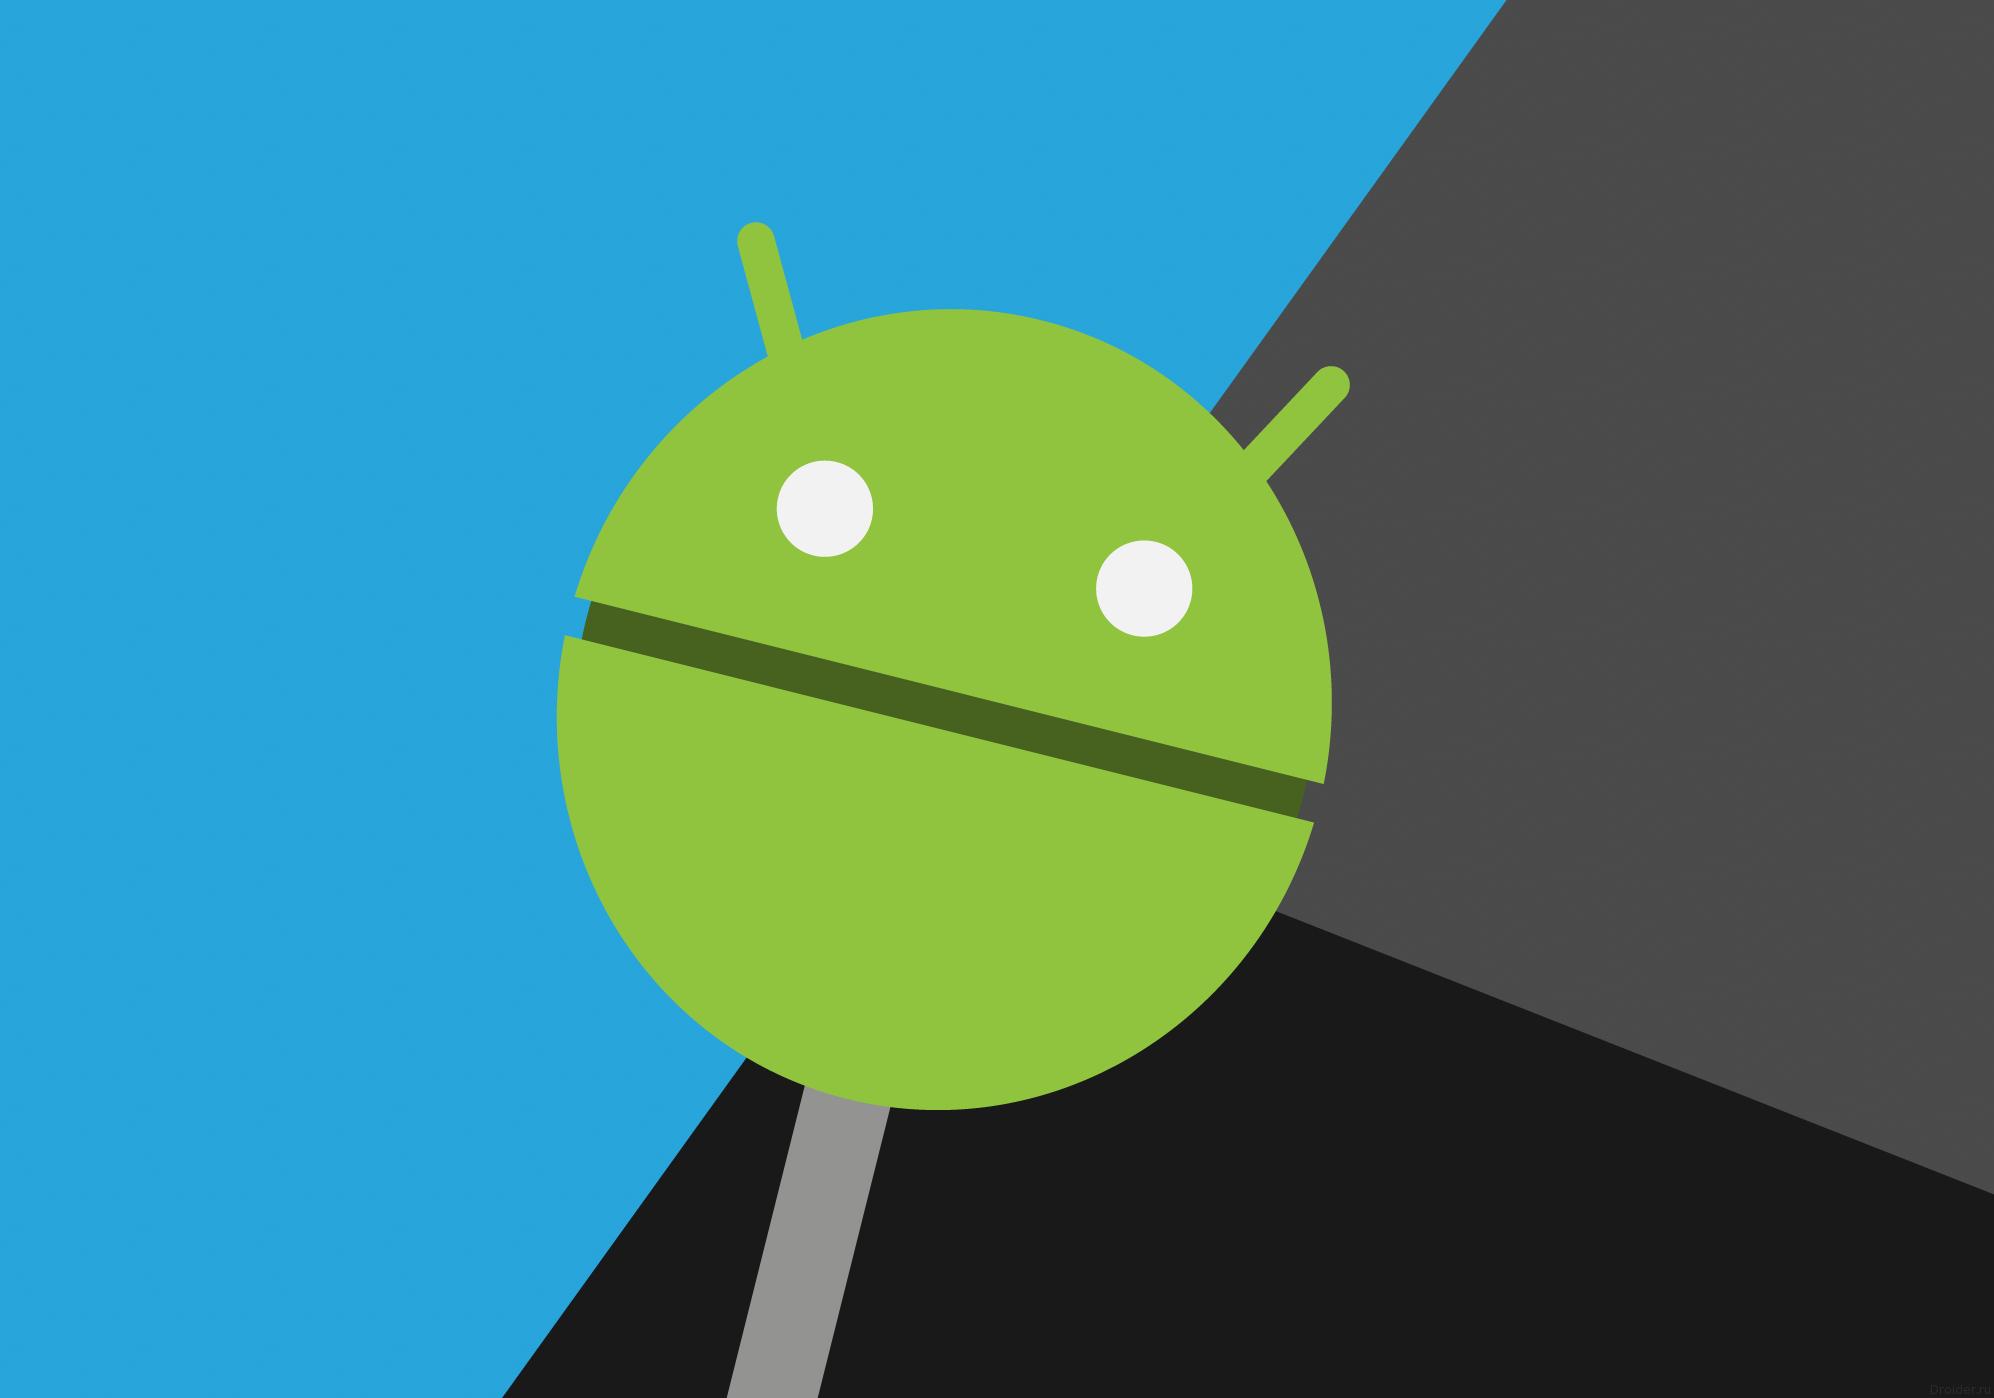 Фан-арт логотипа операционной системы Android 5.0 Lollipop